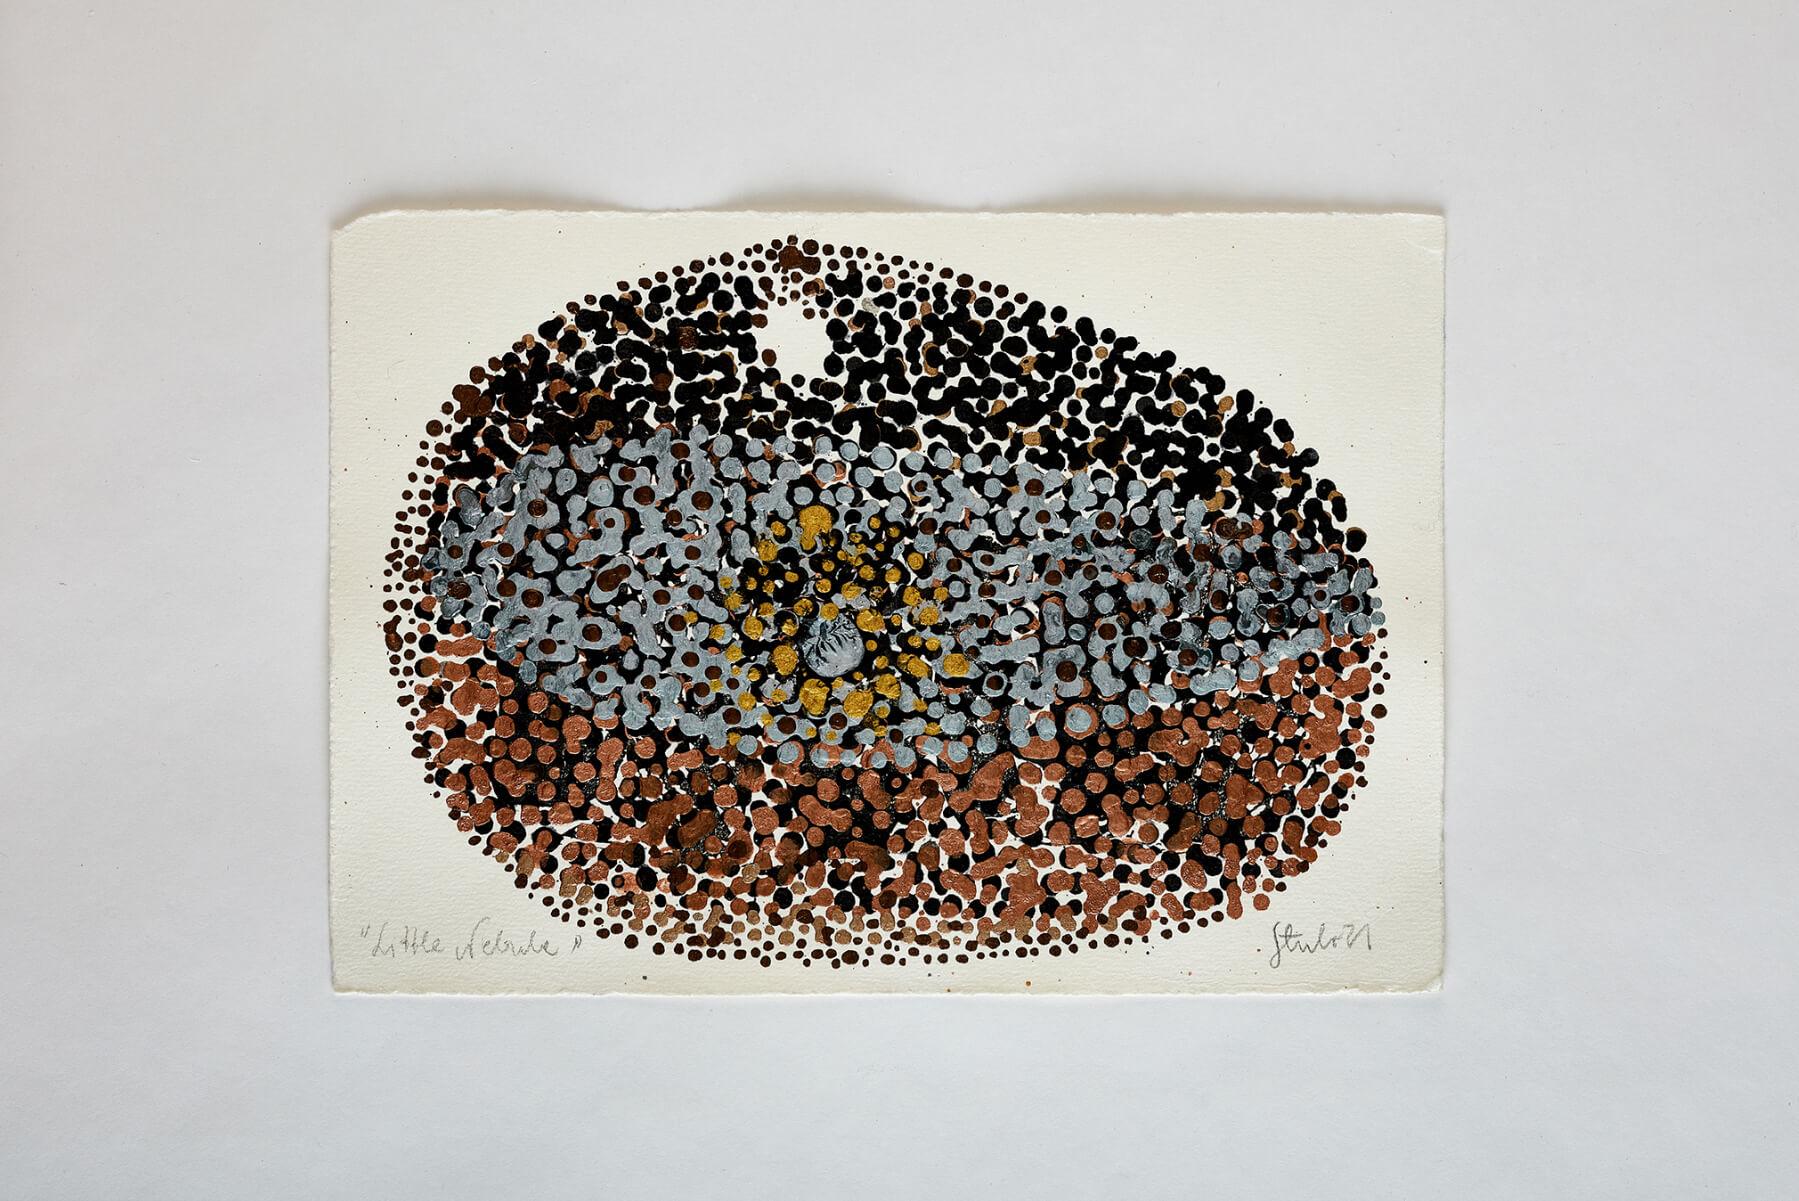 Marianna Stuhr - Little Nebula